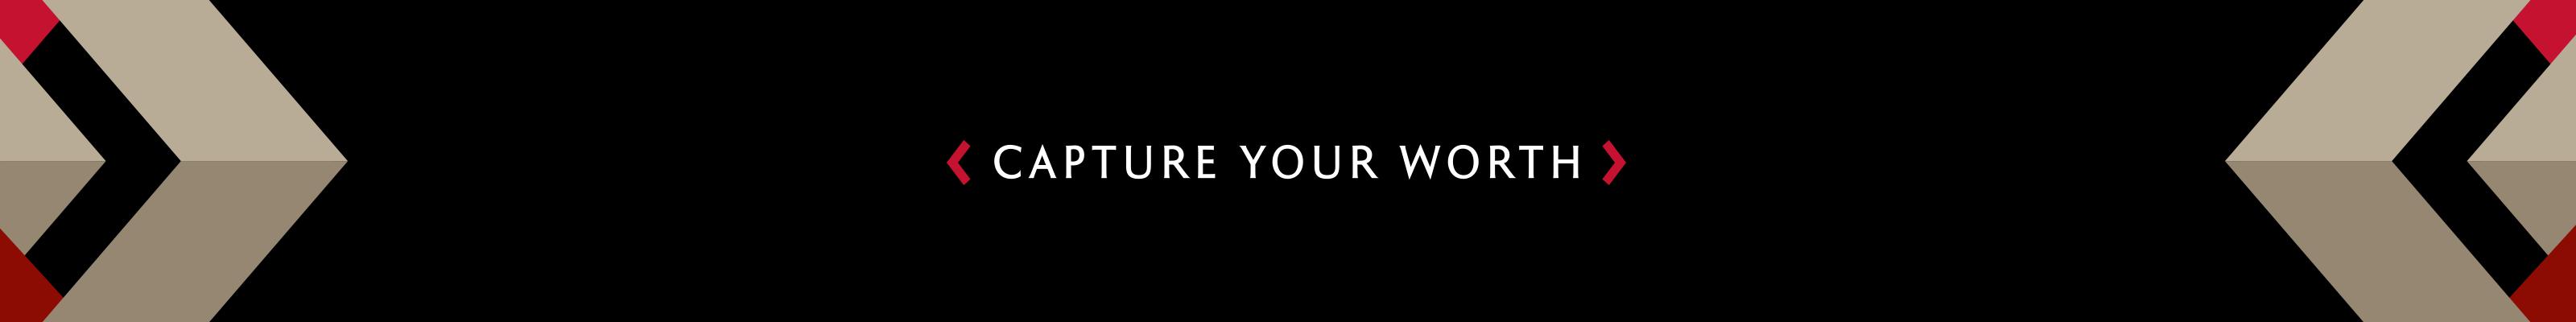 Capture Your Worth Tagline